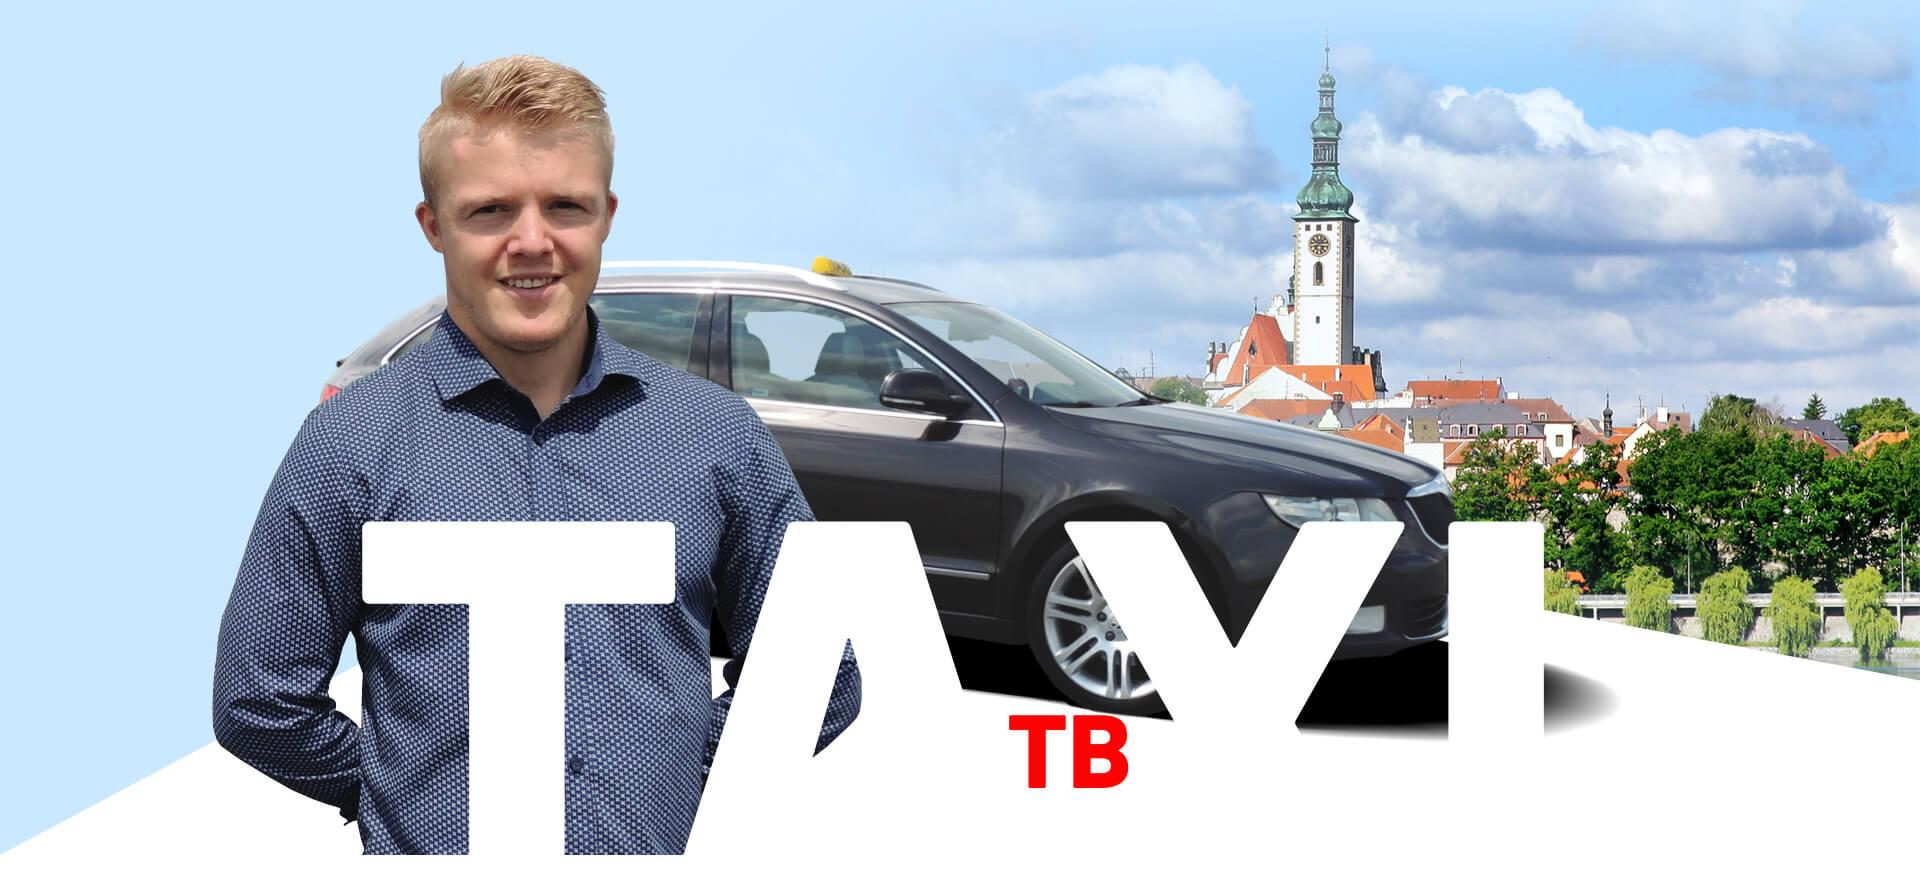 TBtaxi Tábor - nejlevnější taxi